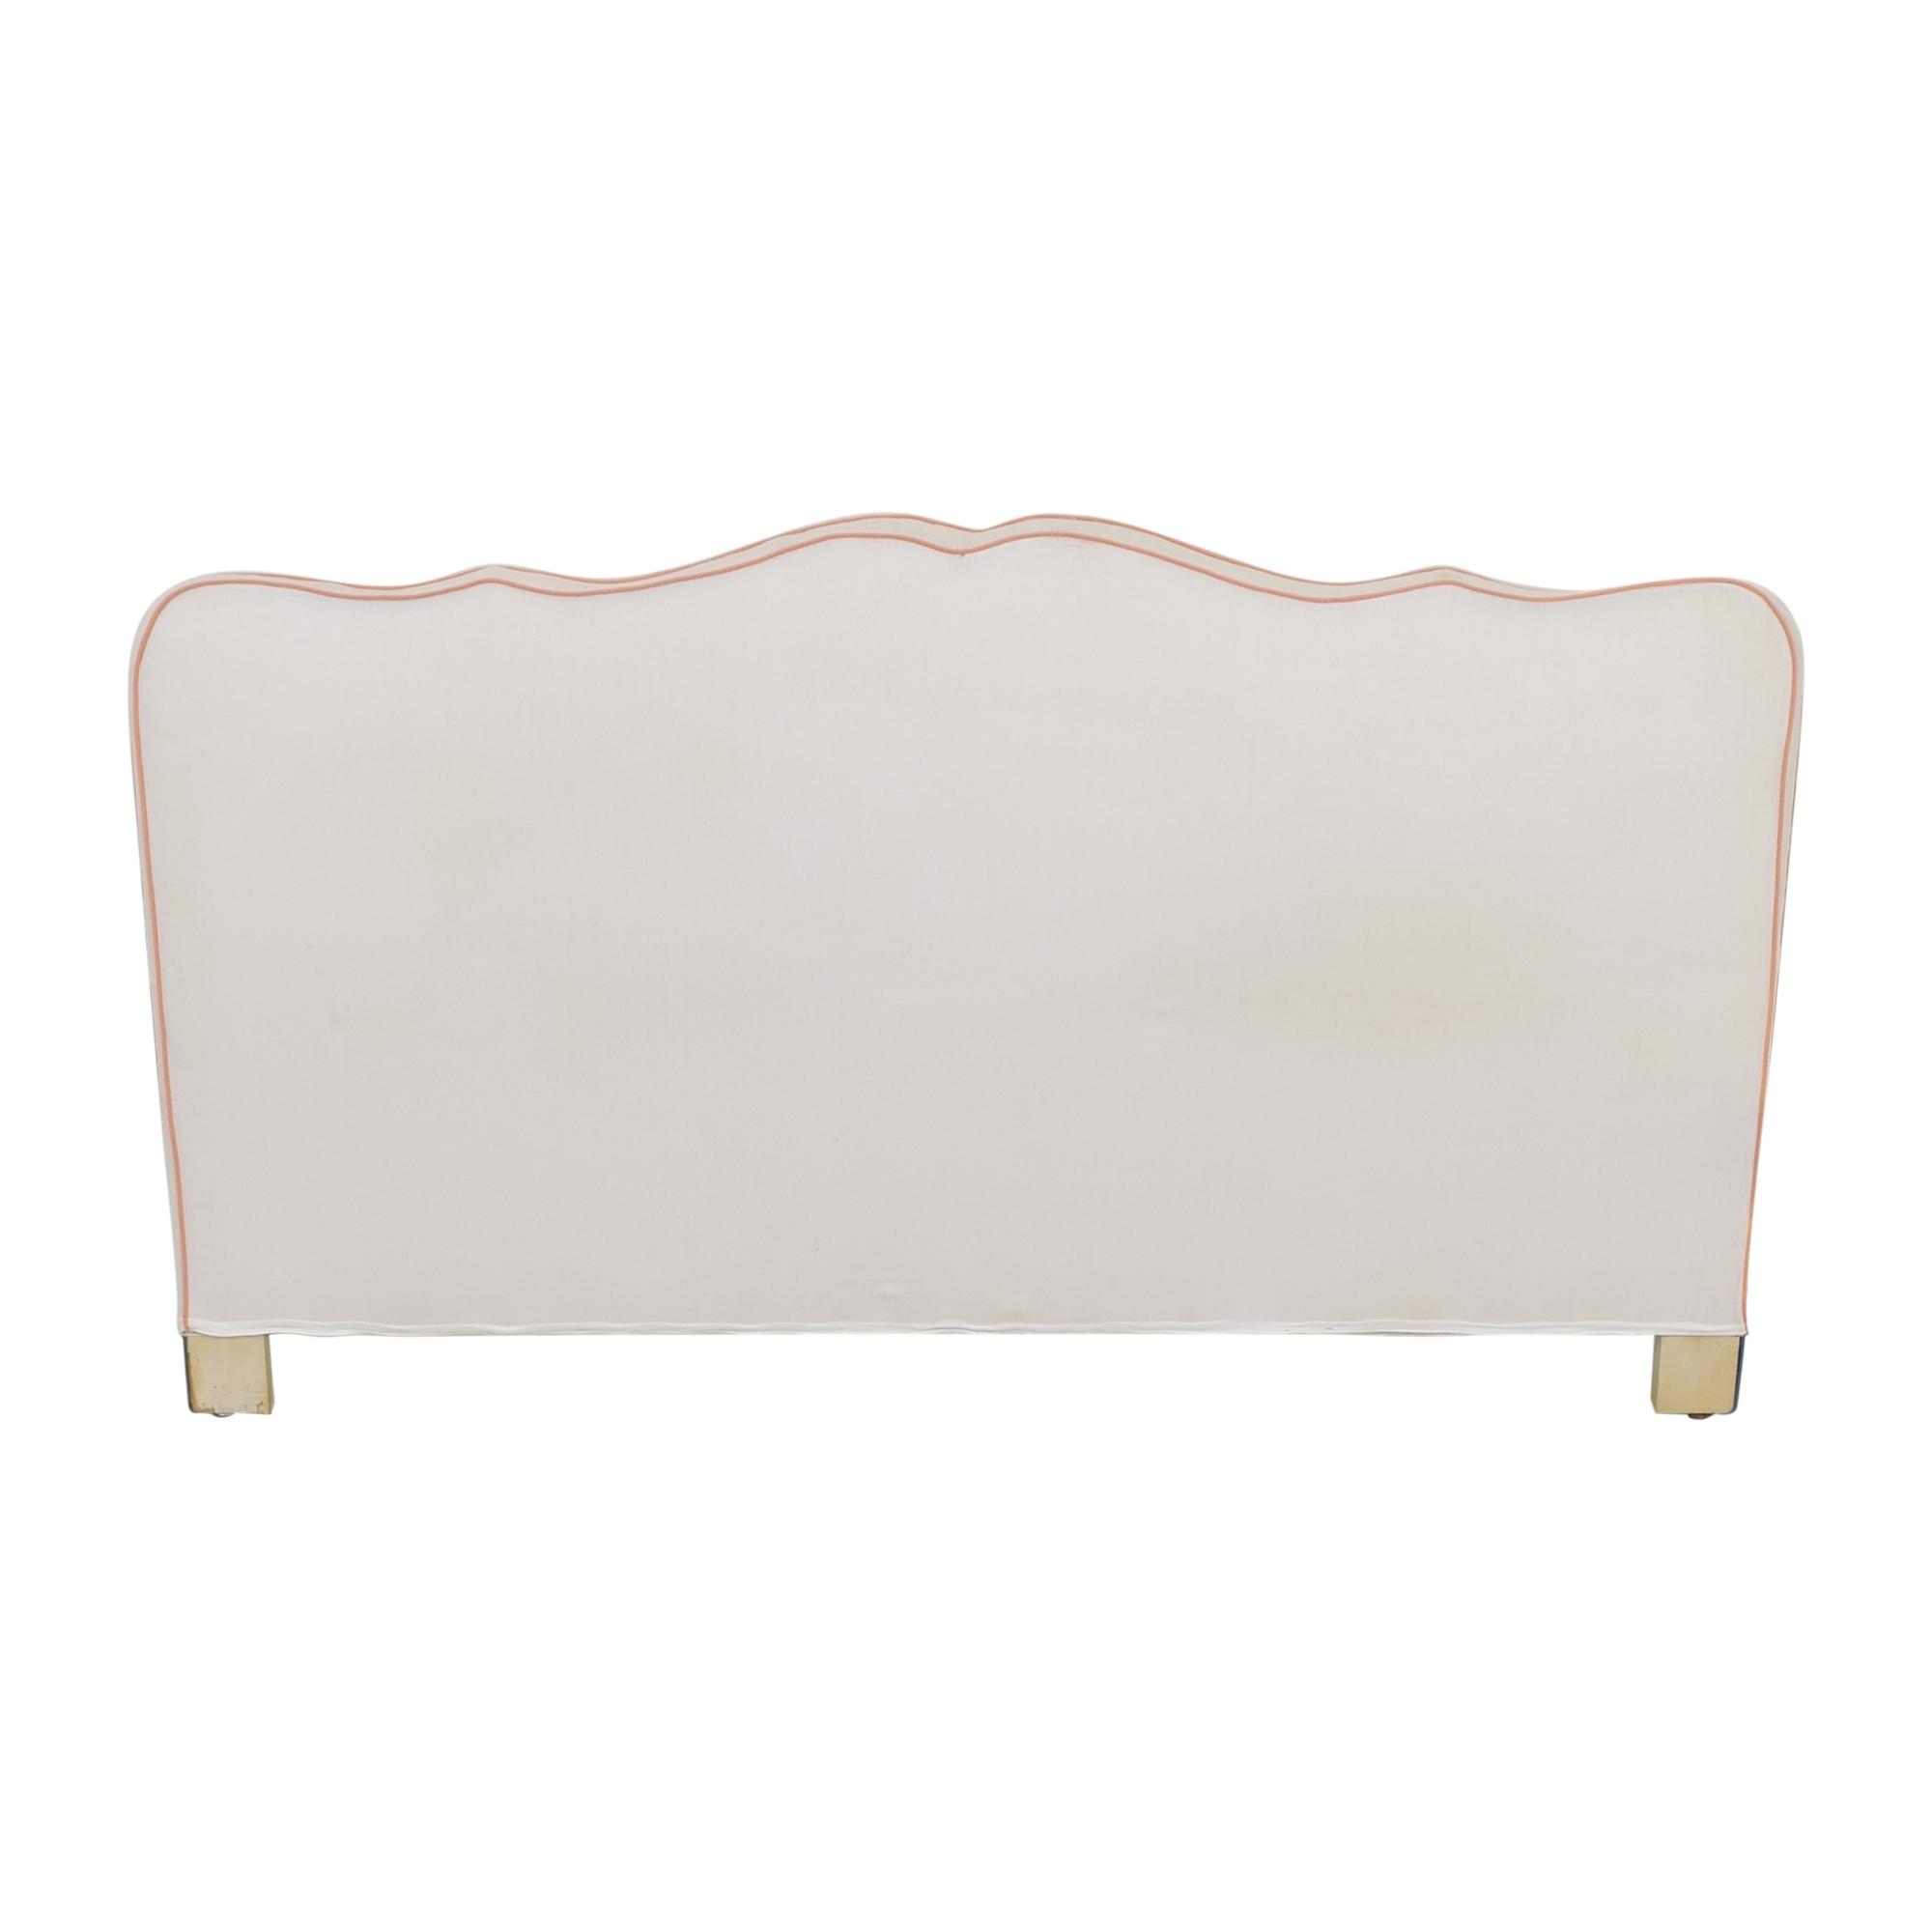 Upholstered Headboard Beds